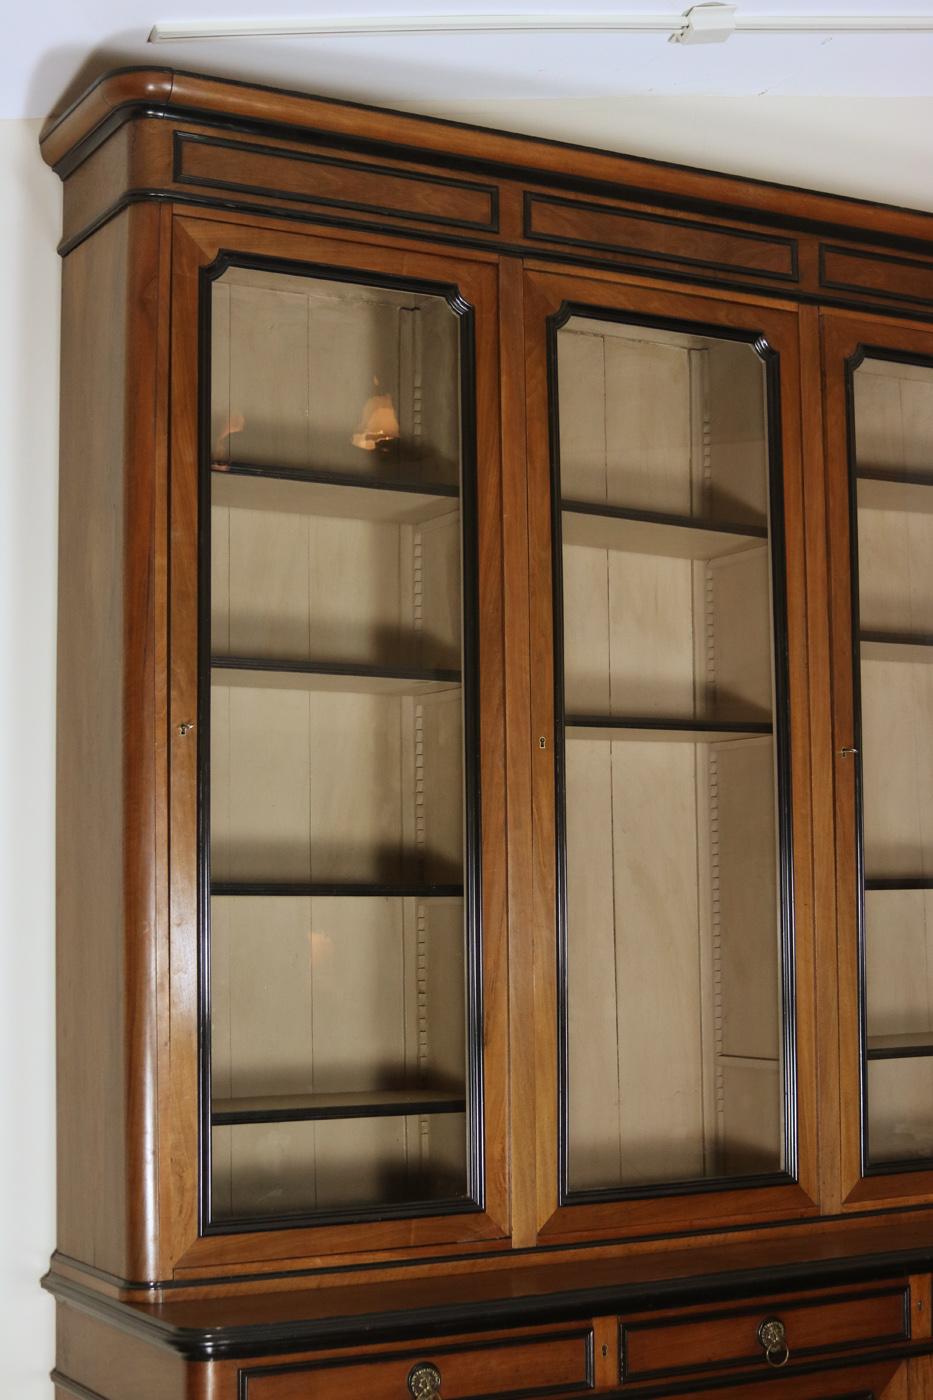 Garden Court Antiques San Francisco An Impressive French Walnut Bureau Bookcase With Ebonized Trim